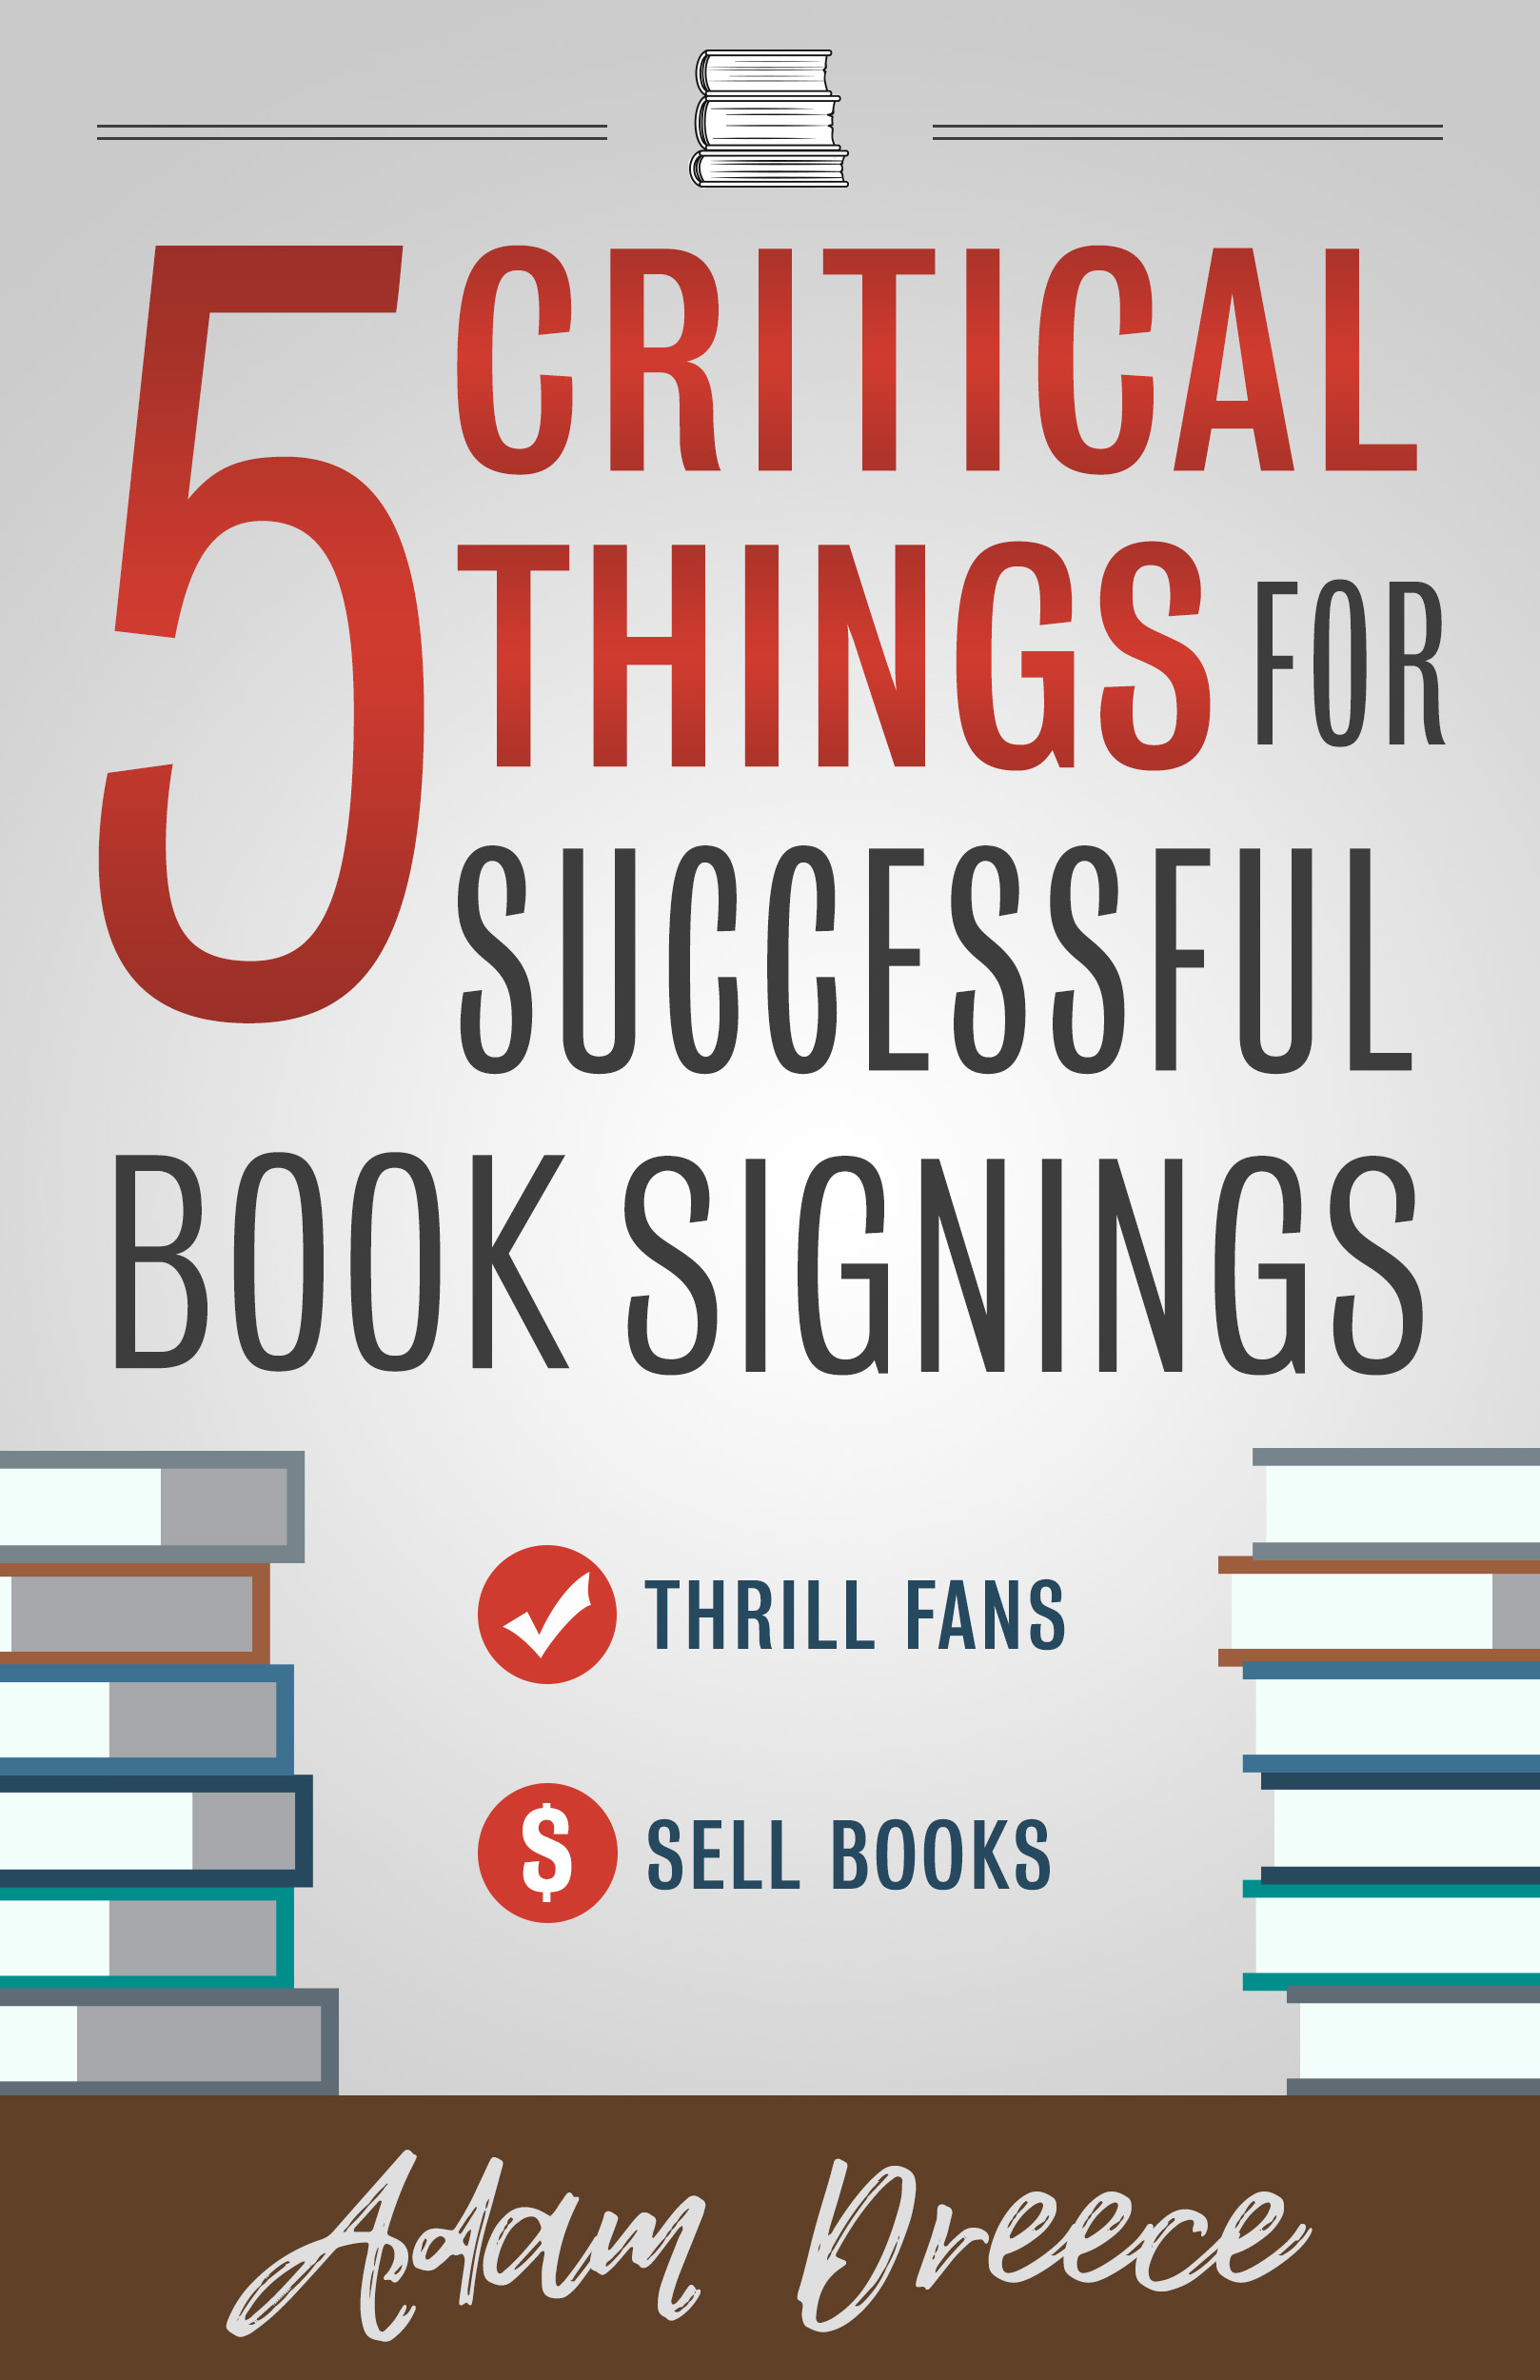 5 Critical Things Book Signings.jpg